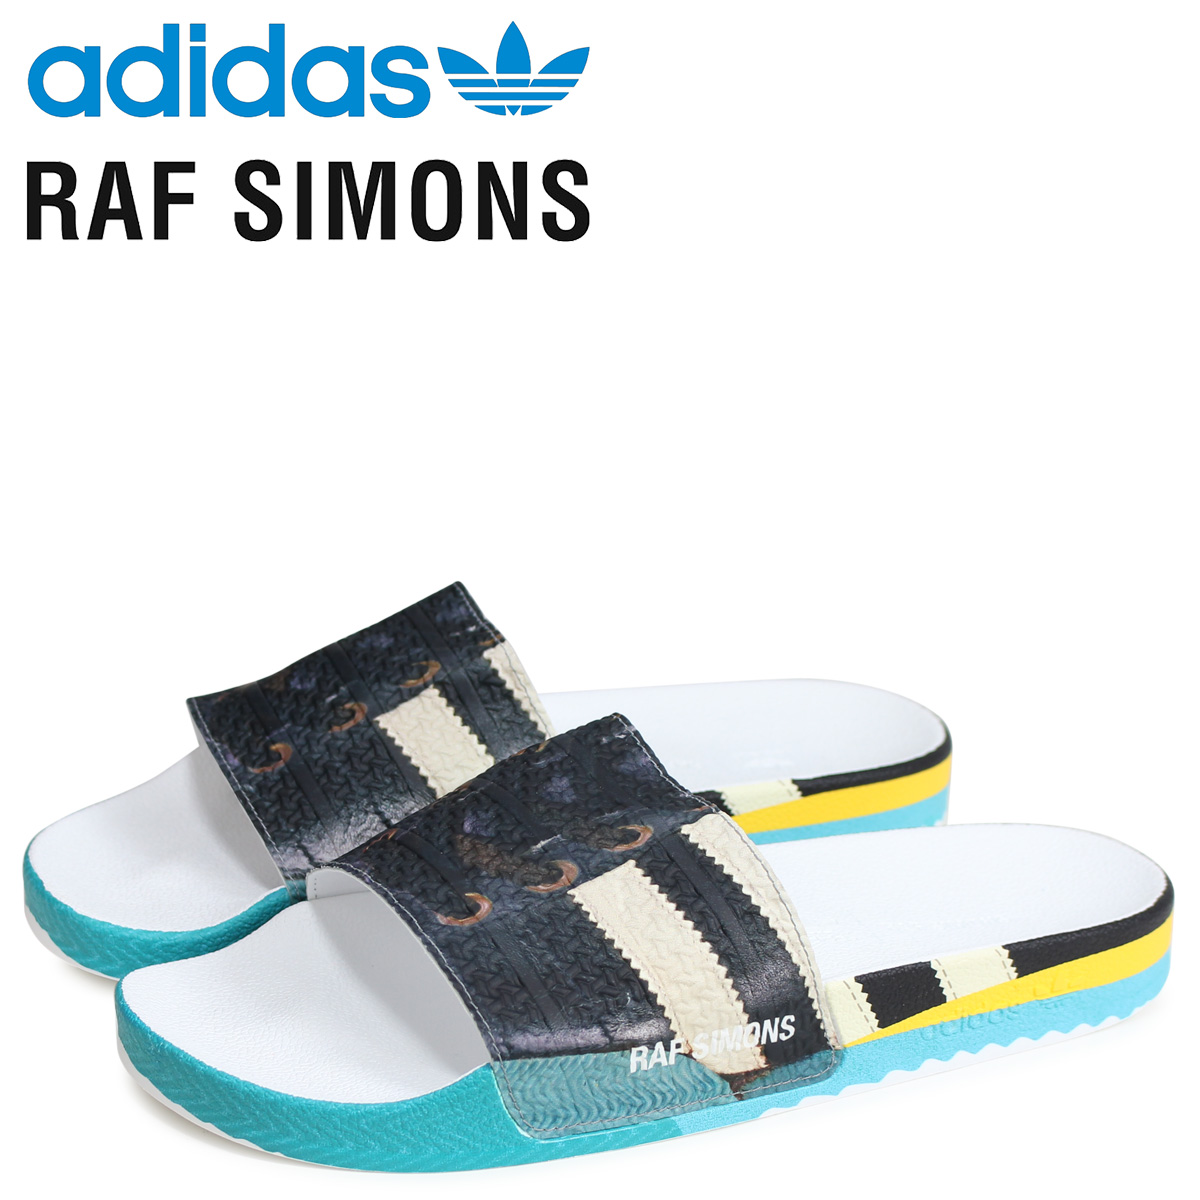 adidas Originals アディダス オリジナルス ラフシモンズ RAF SIMONS サンバ アディレッタ サンダル シャワーサンダル メンズ RS SAMBA ADILETTE コラボ ブラック 黒 EE7959